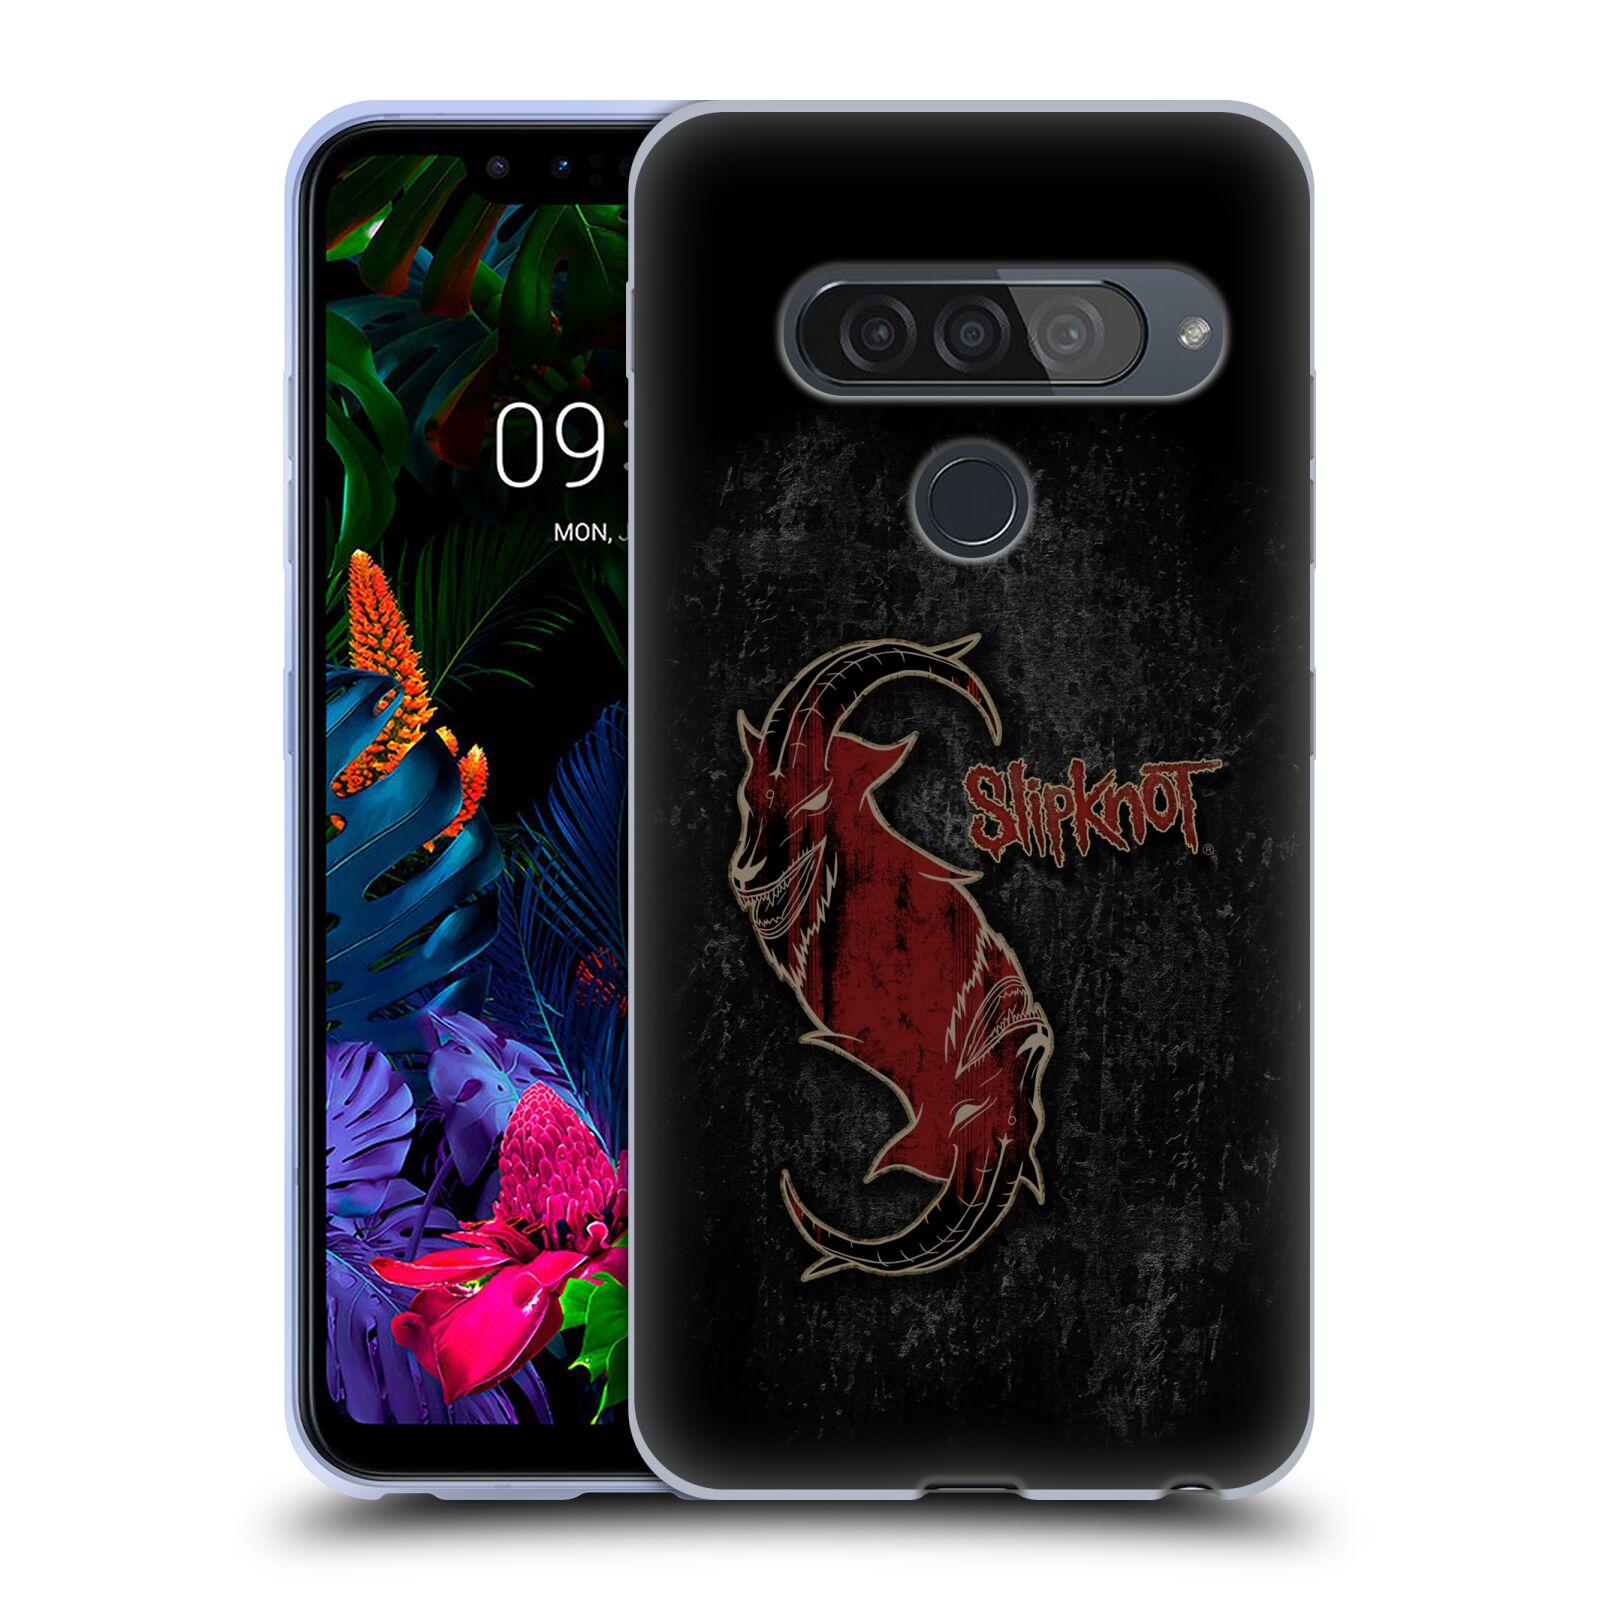 Silikonové pouzdro na mobil LG G8s ThinQ - Head Case - Slipknot - Rudý kozel